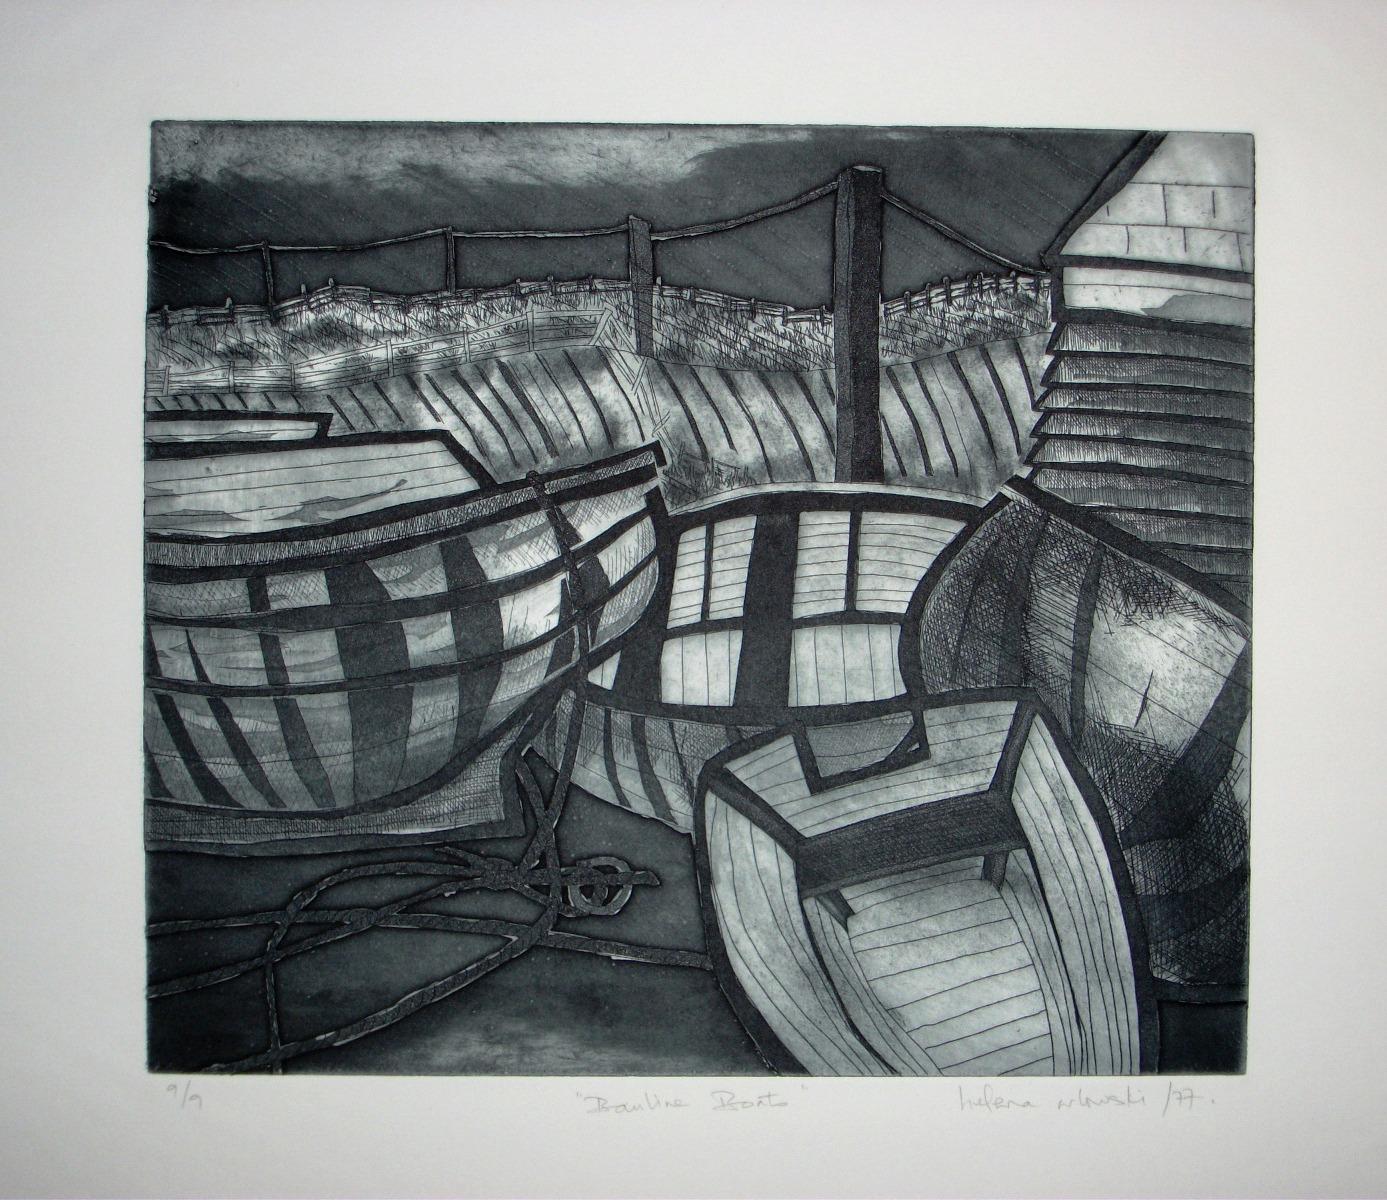 Bauline-Boats-etching-300-x-350, by the artist Helena Orlowski